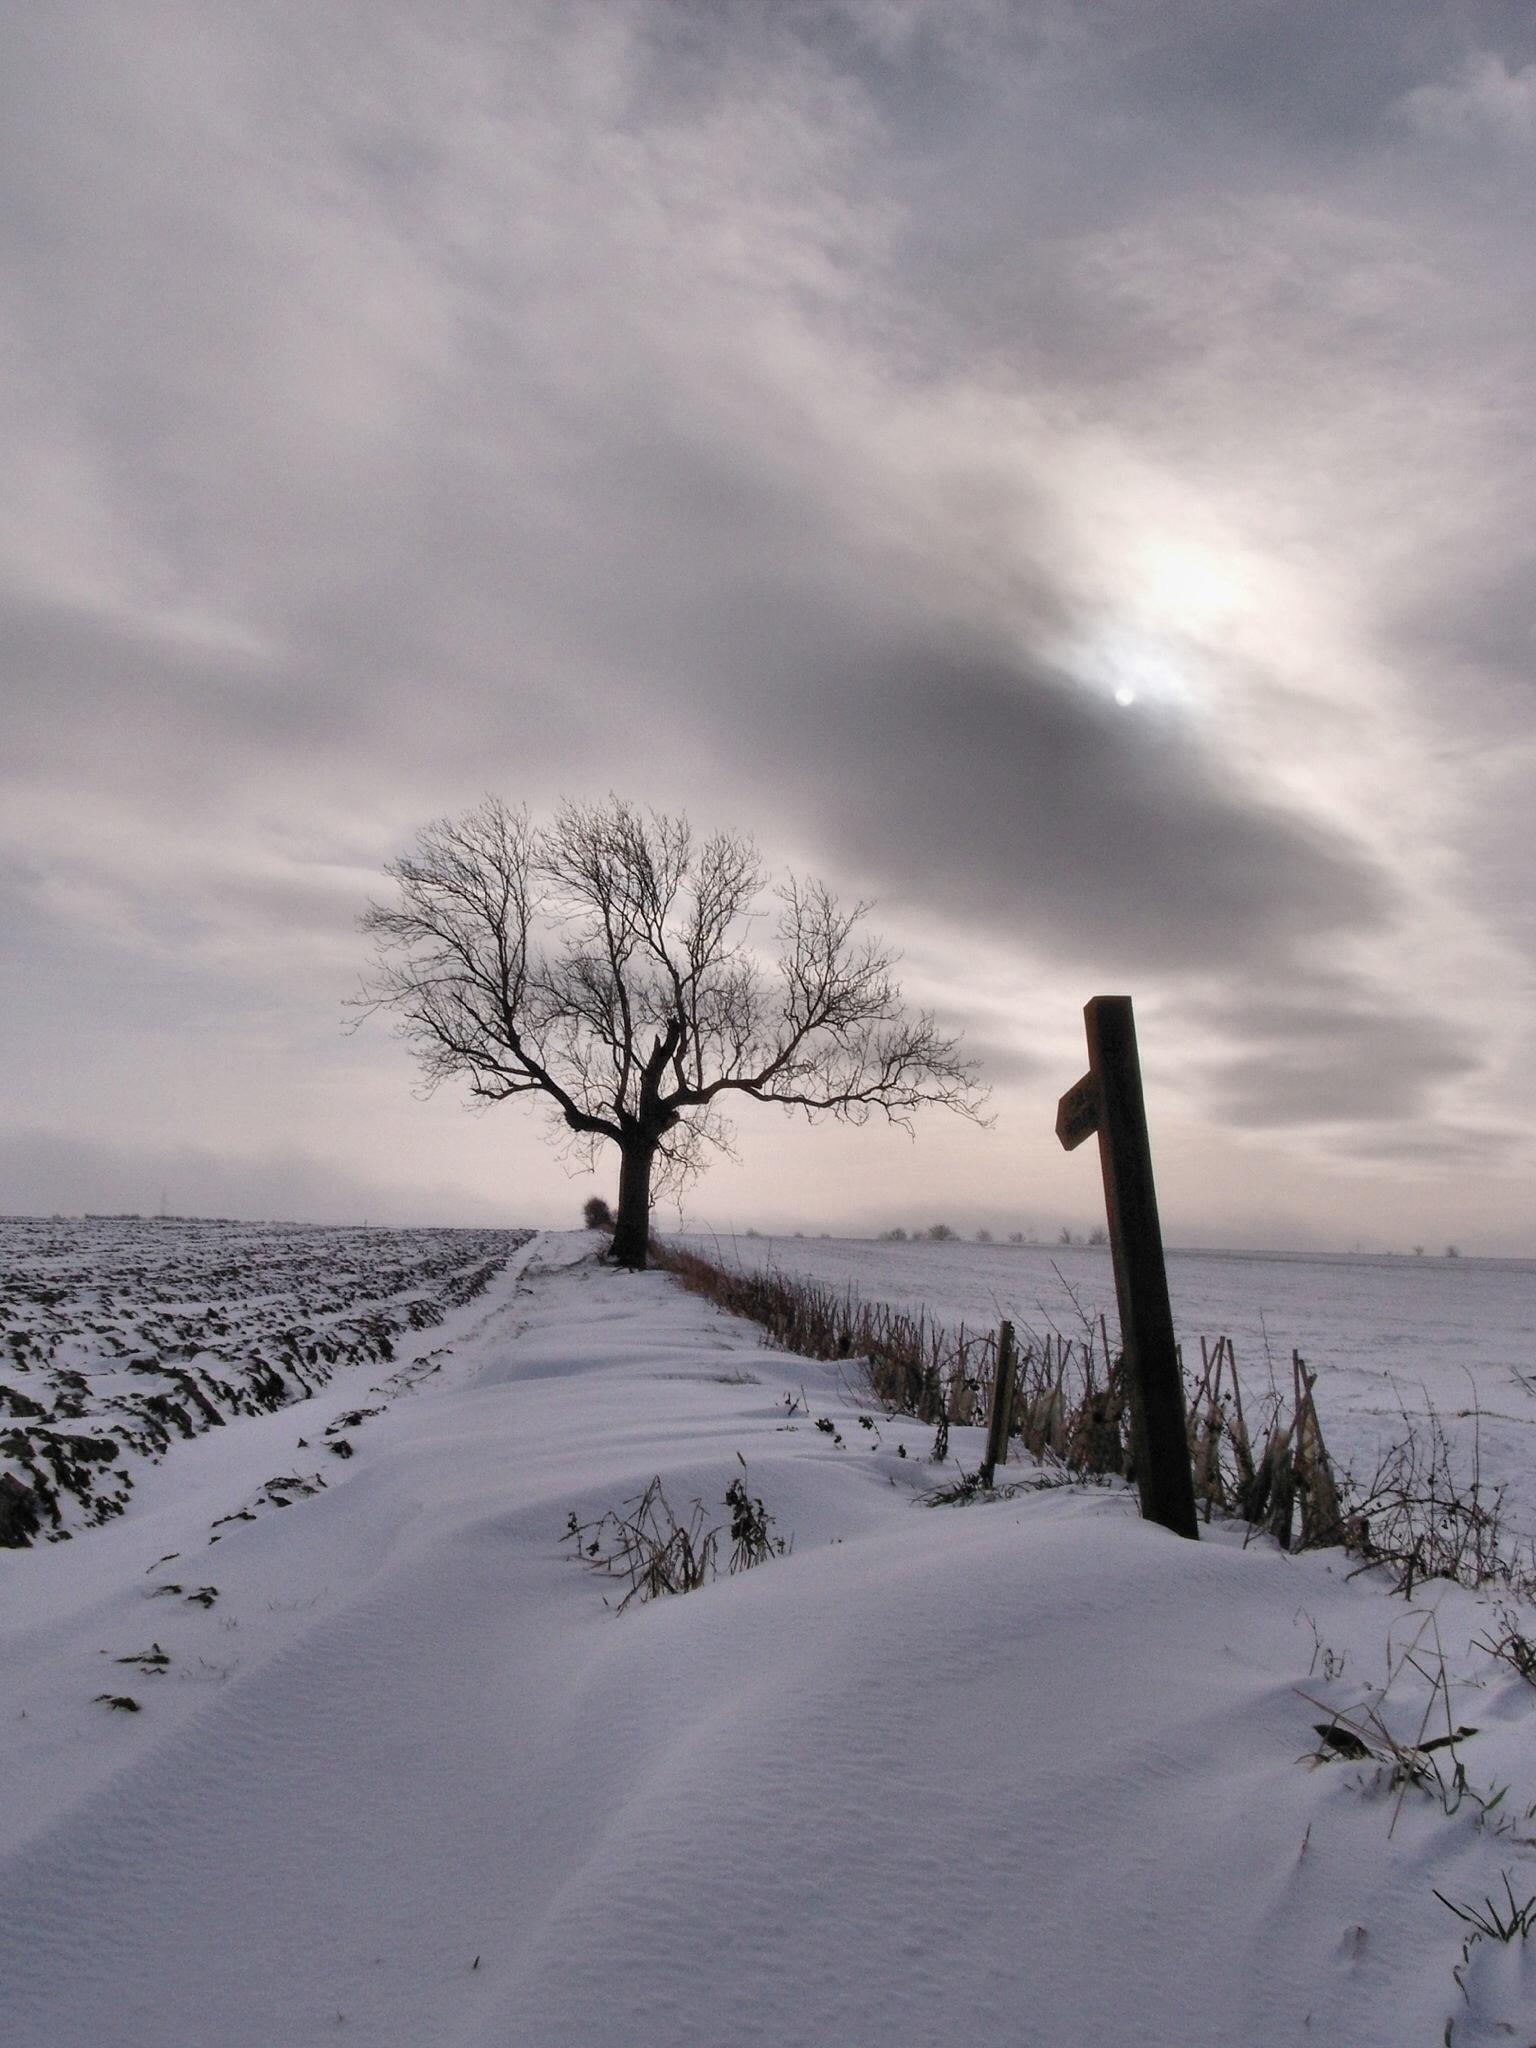 A Winters Tale by slcouzens